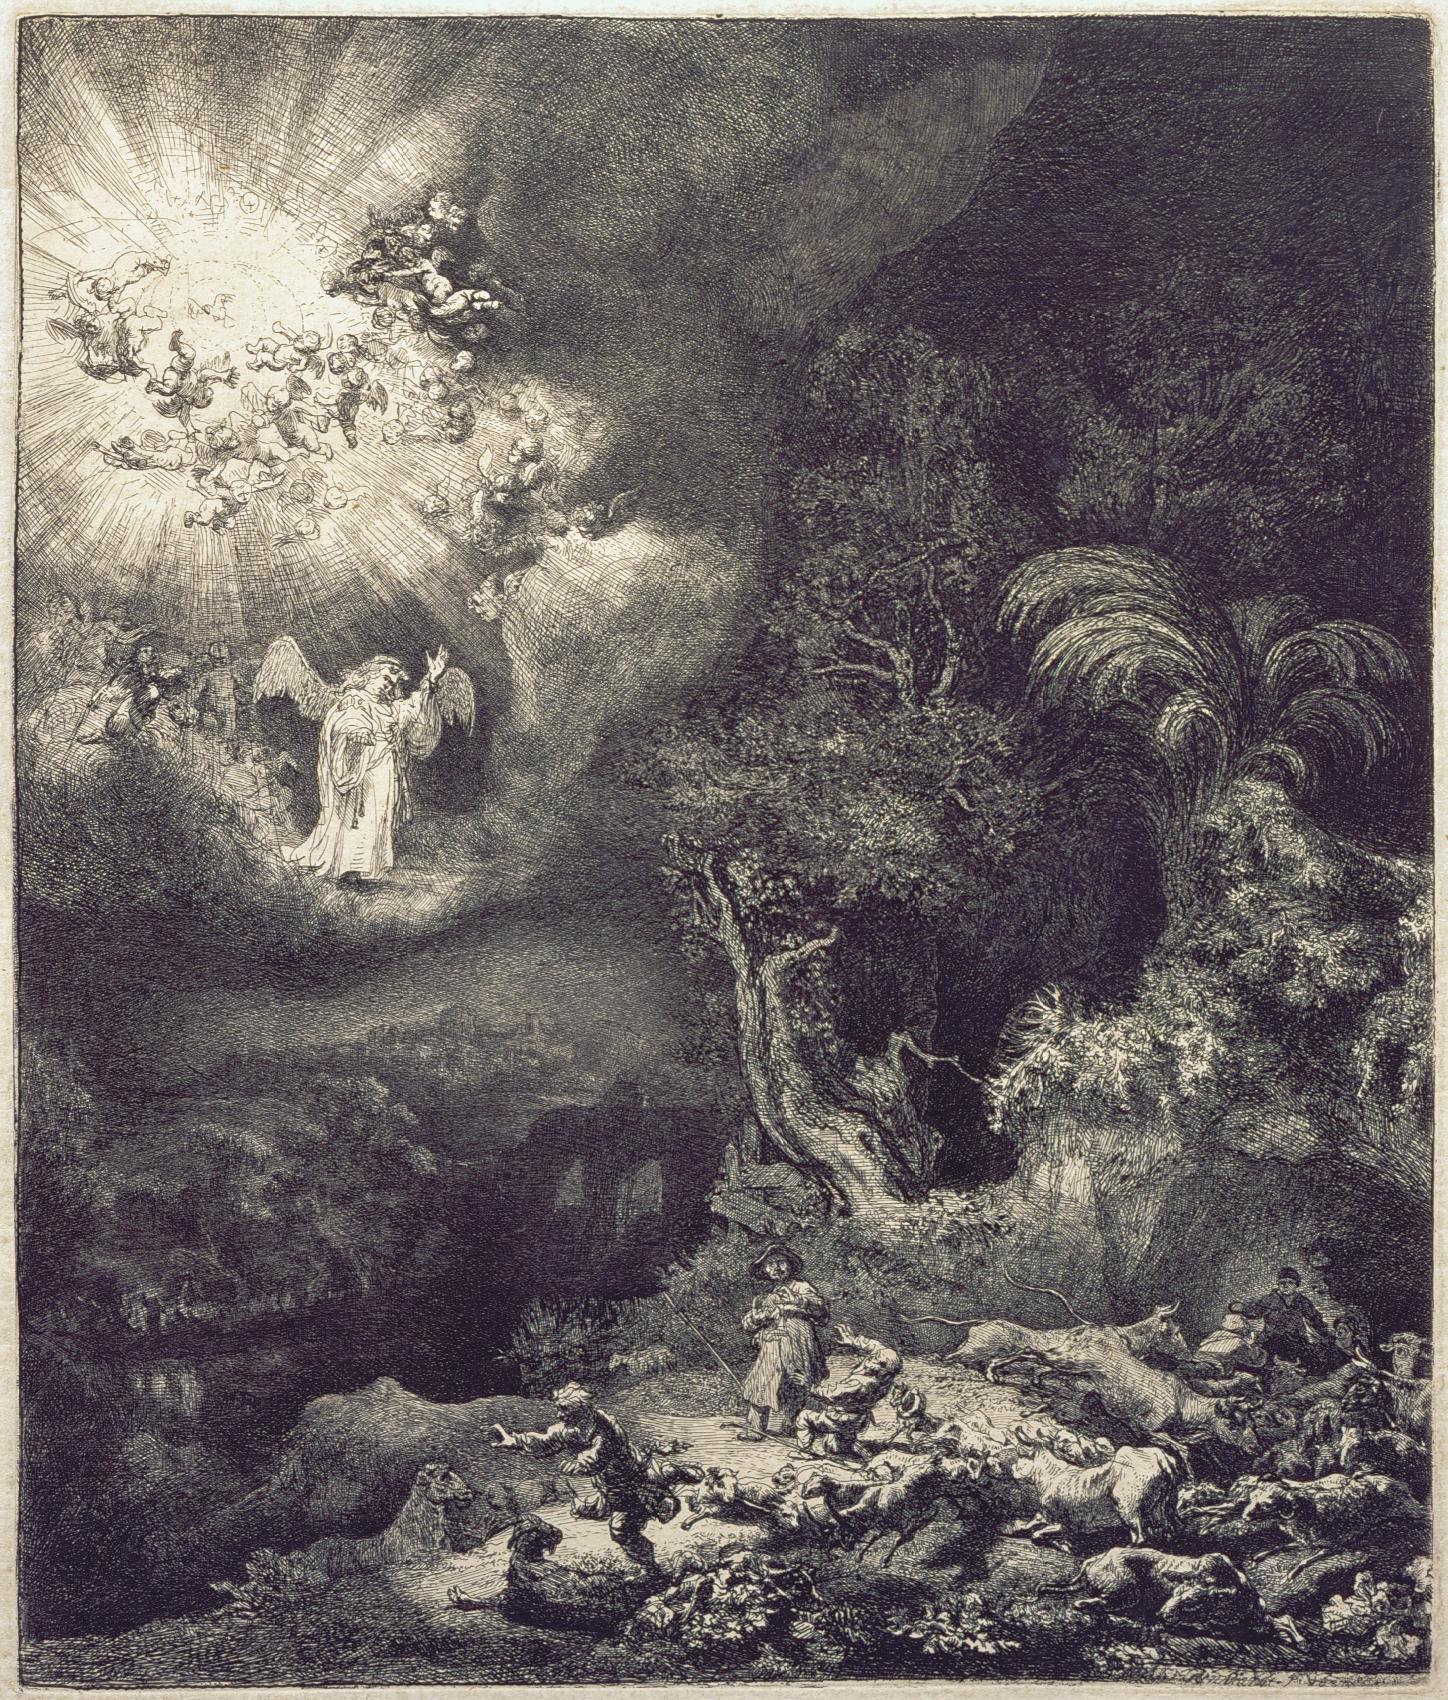 Výsledek obrázku pro rembrandt annunciation shepherds